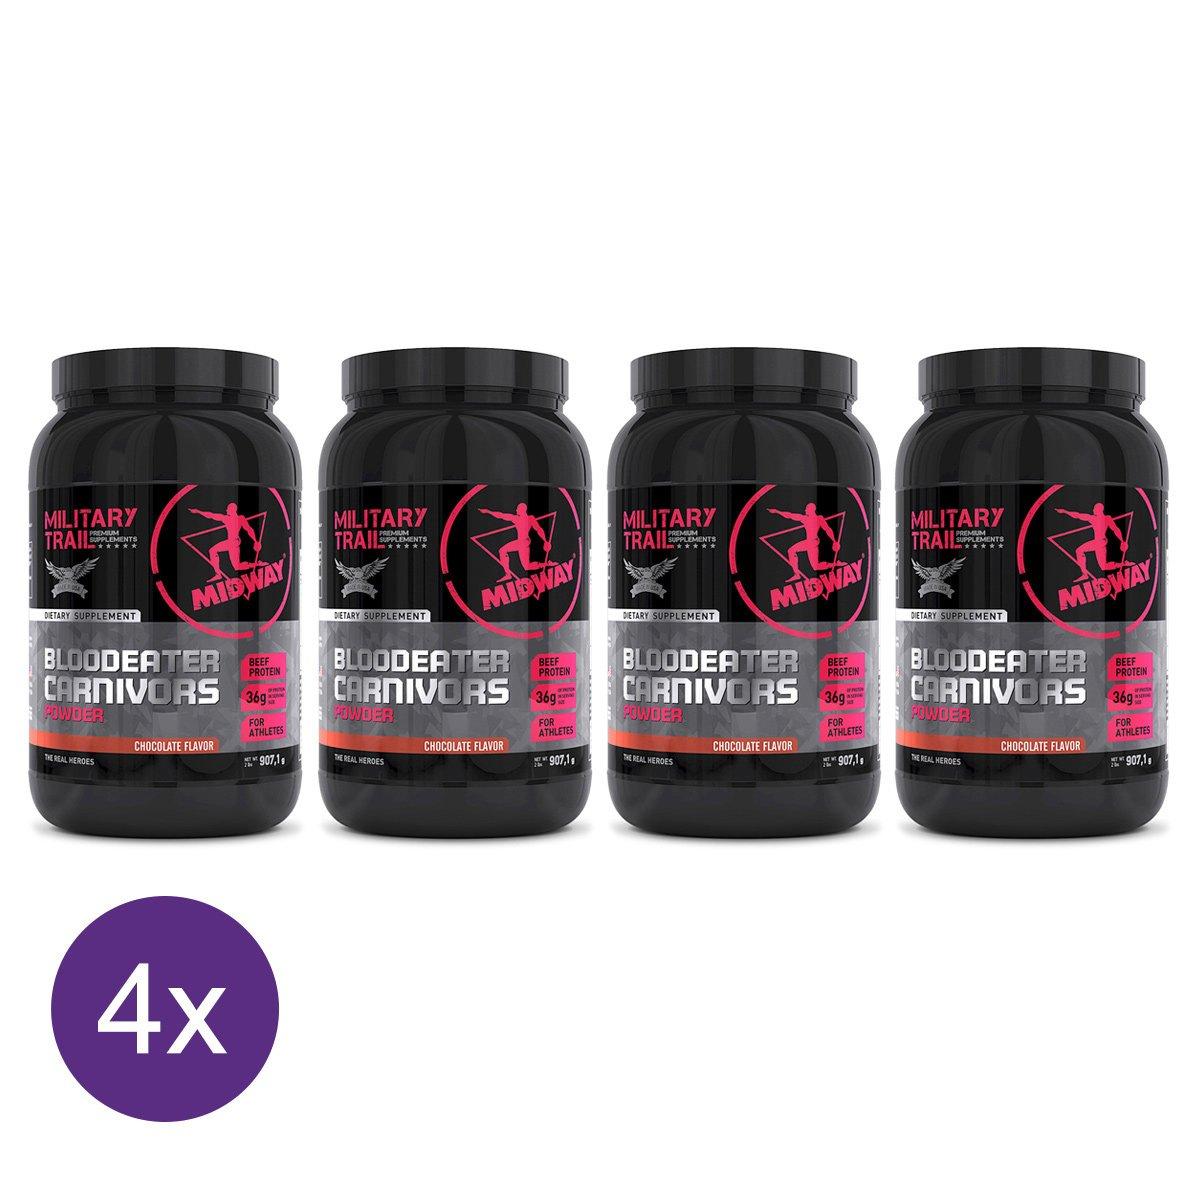 015ab49b2 Kit 4x Blood Eater Carnivors - Proteína da Carne com creatina e ferro 907g  Military Trail - Compre Agora